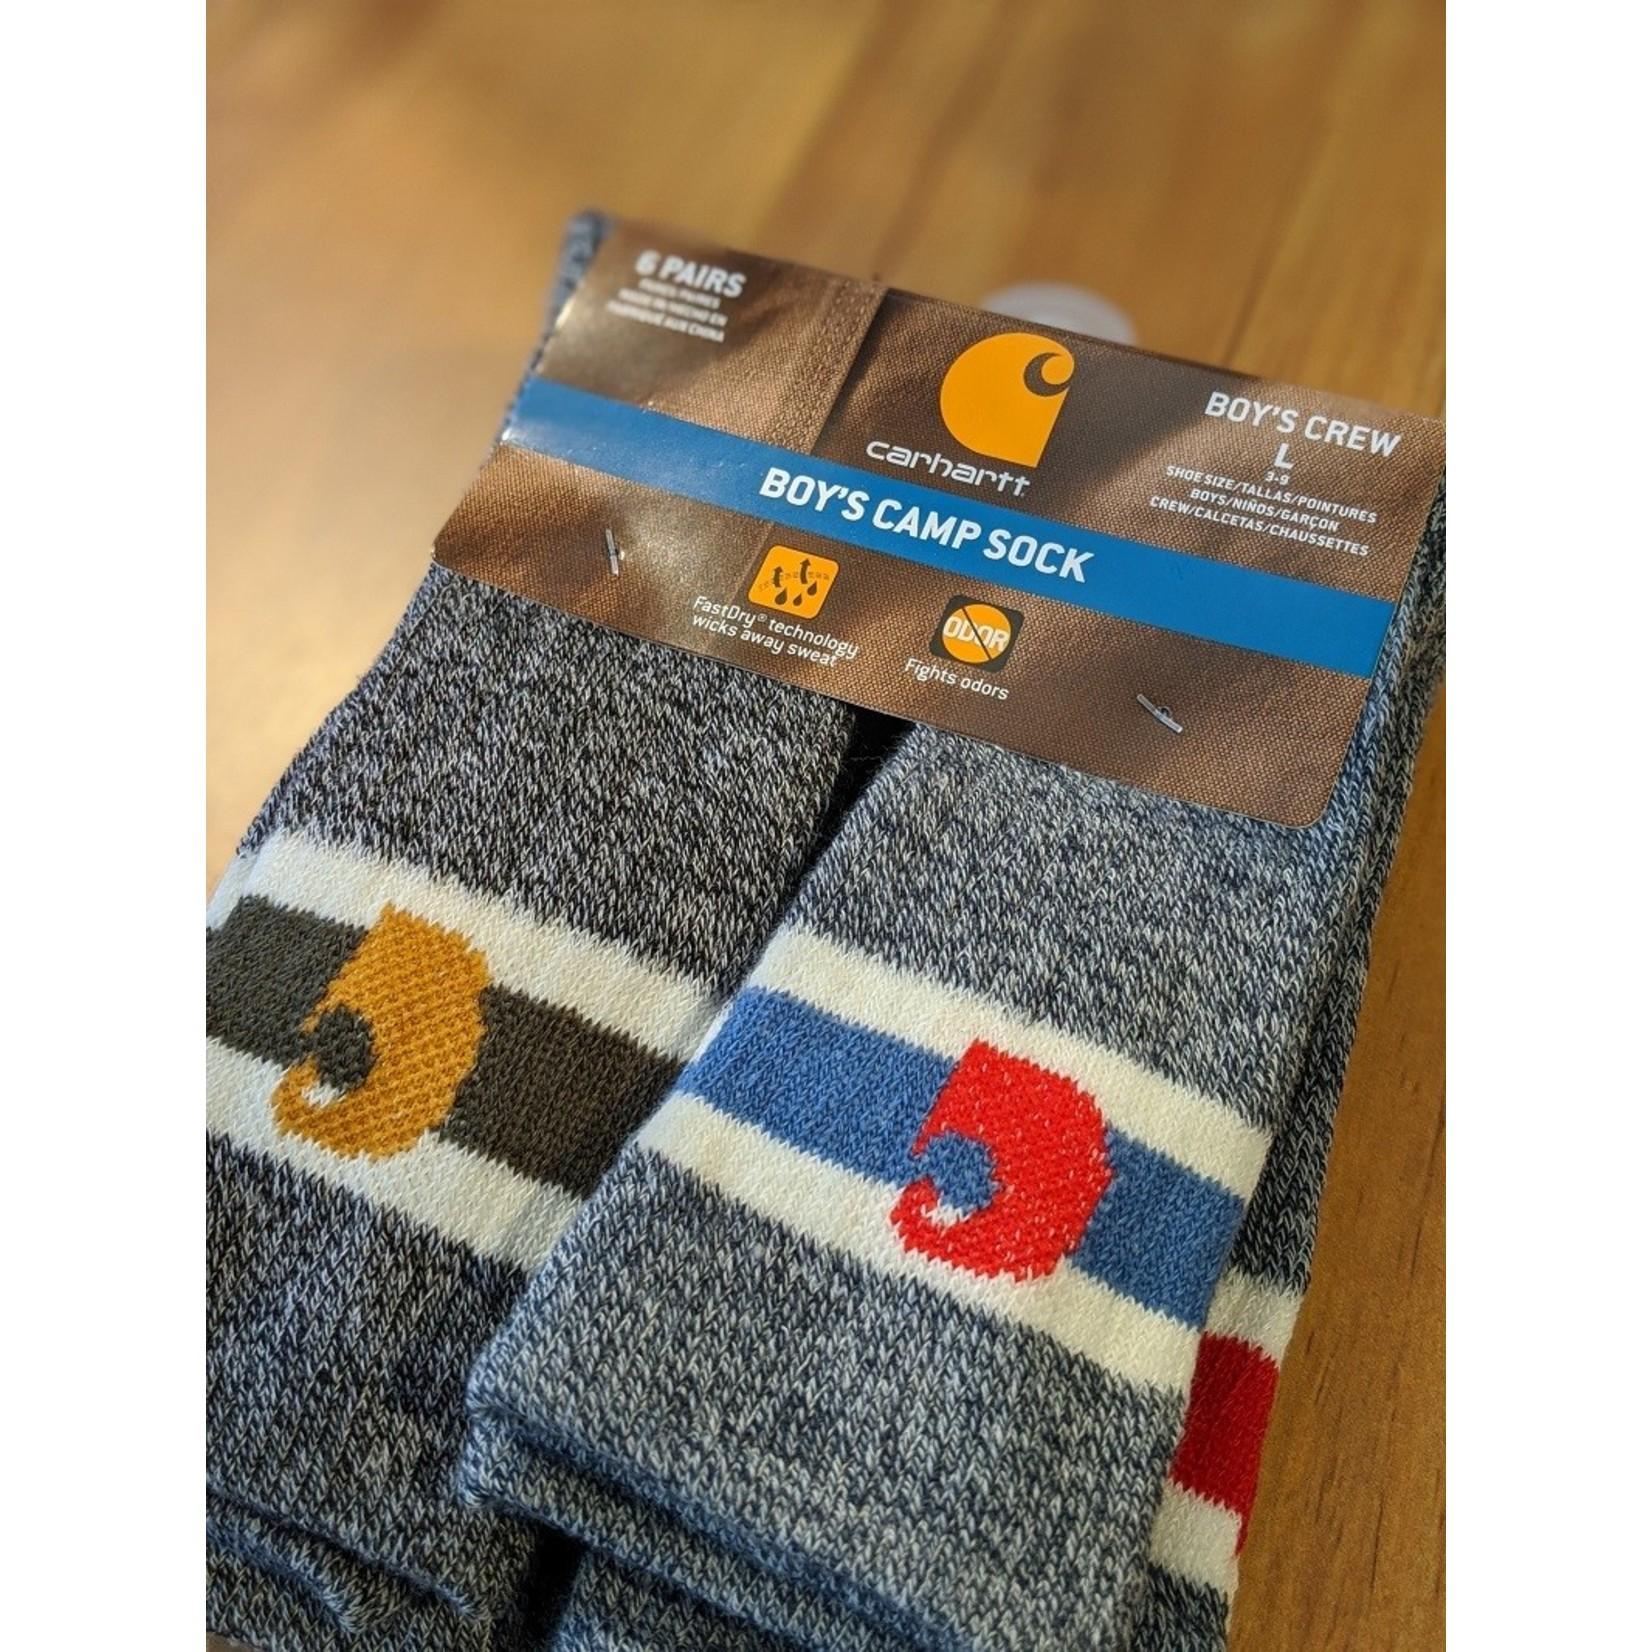 Carhartt Carhartt Boys 6pk Camp Socks